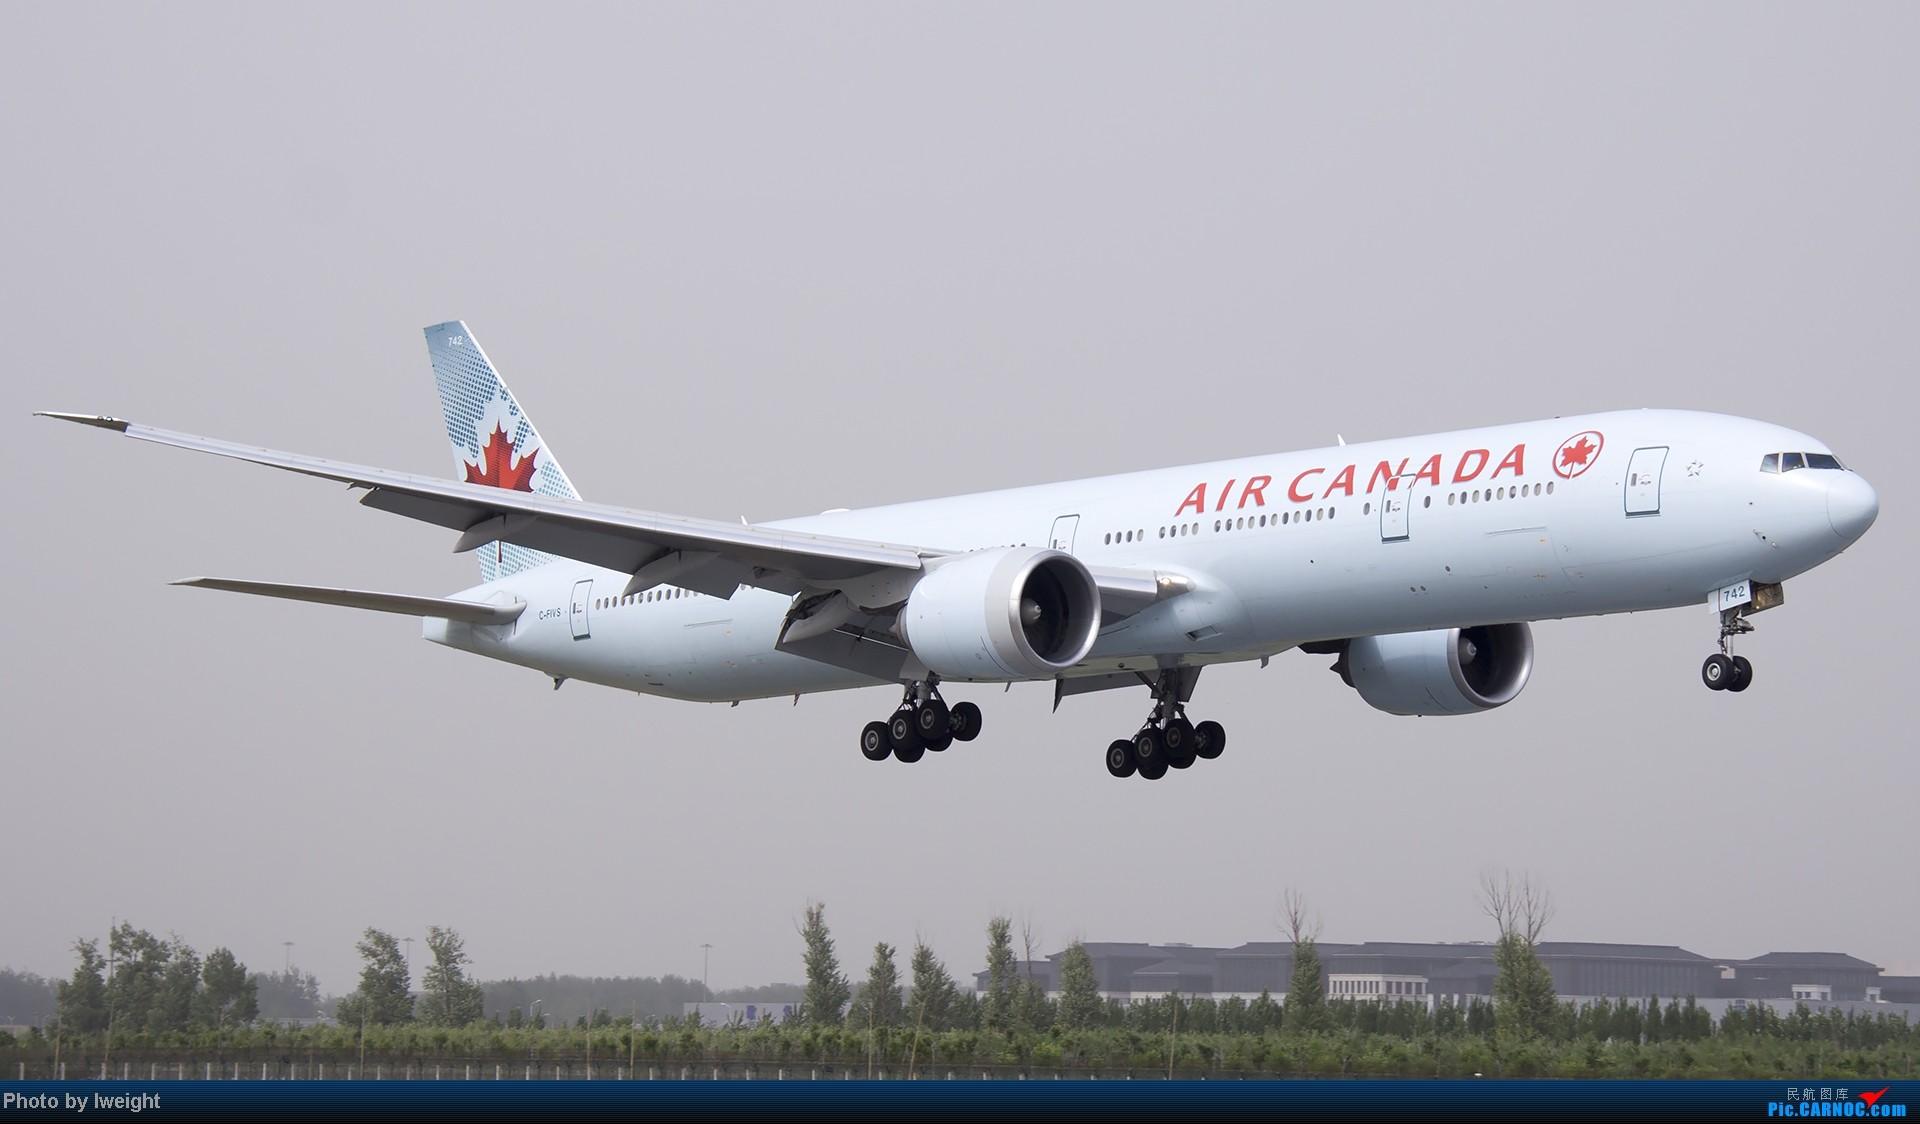 Re:[原创]霾天首都机场随拍 BOEING 777-300ER C-FIVS 中国北京首都机场